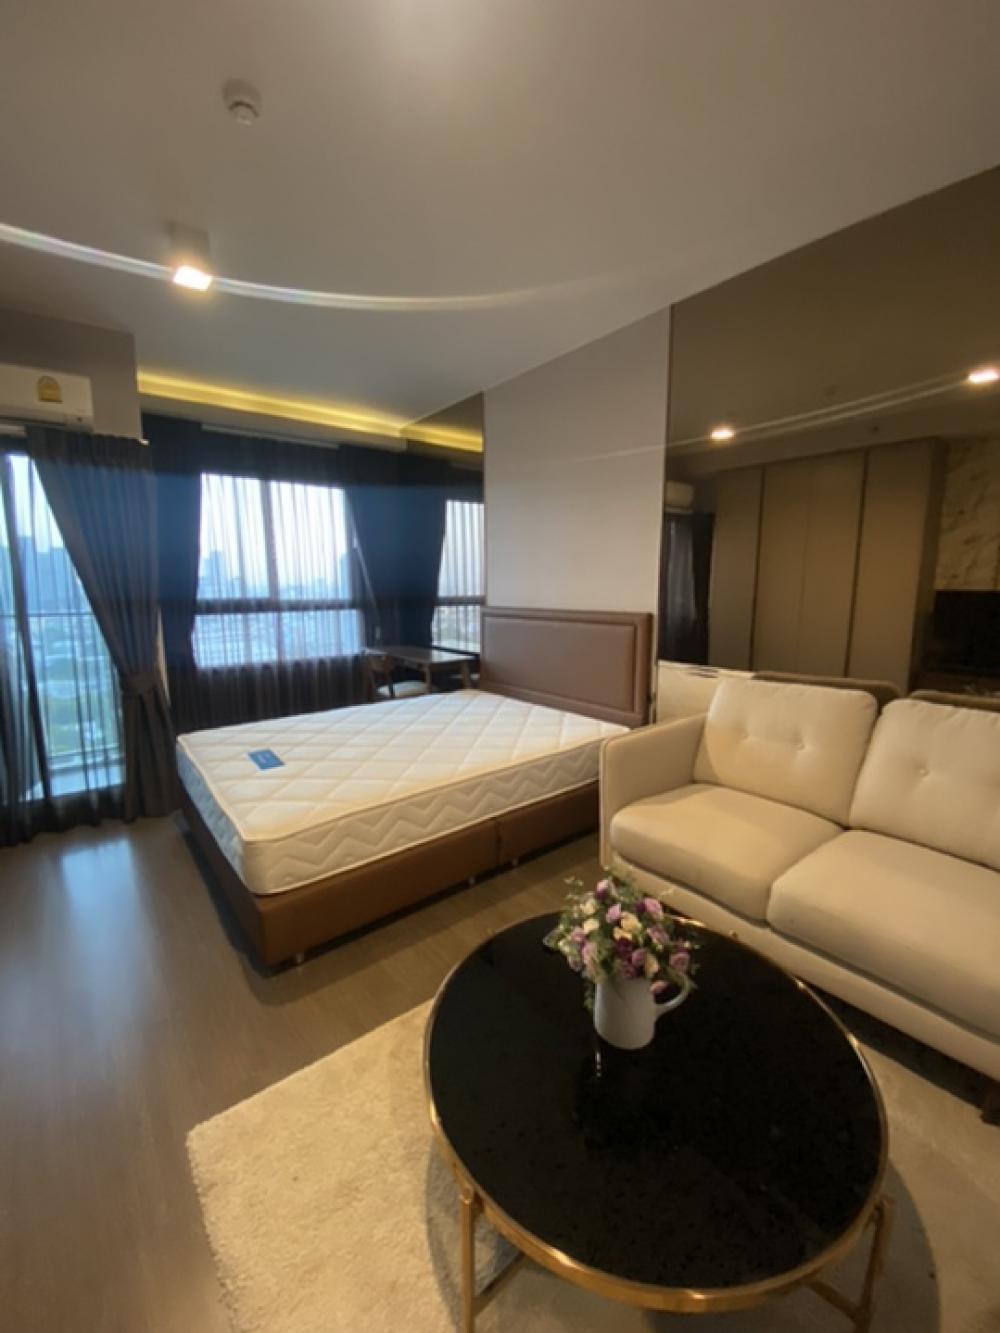 For RentCondoOnnut, Udomsuk : Ideo Sukhumvit 93 Studio for rent 10,000 / month only